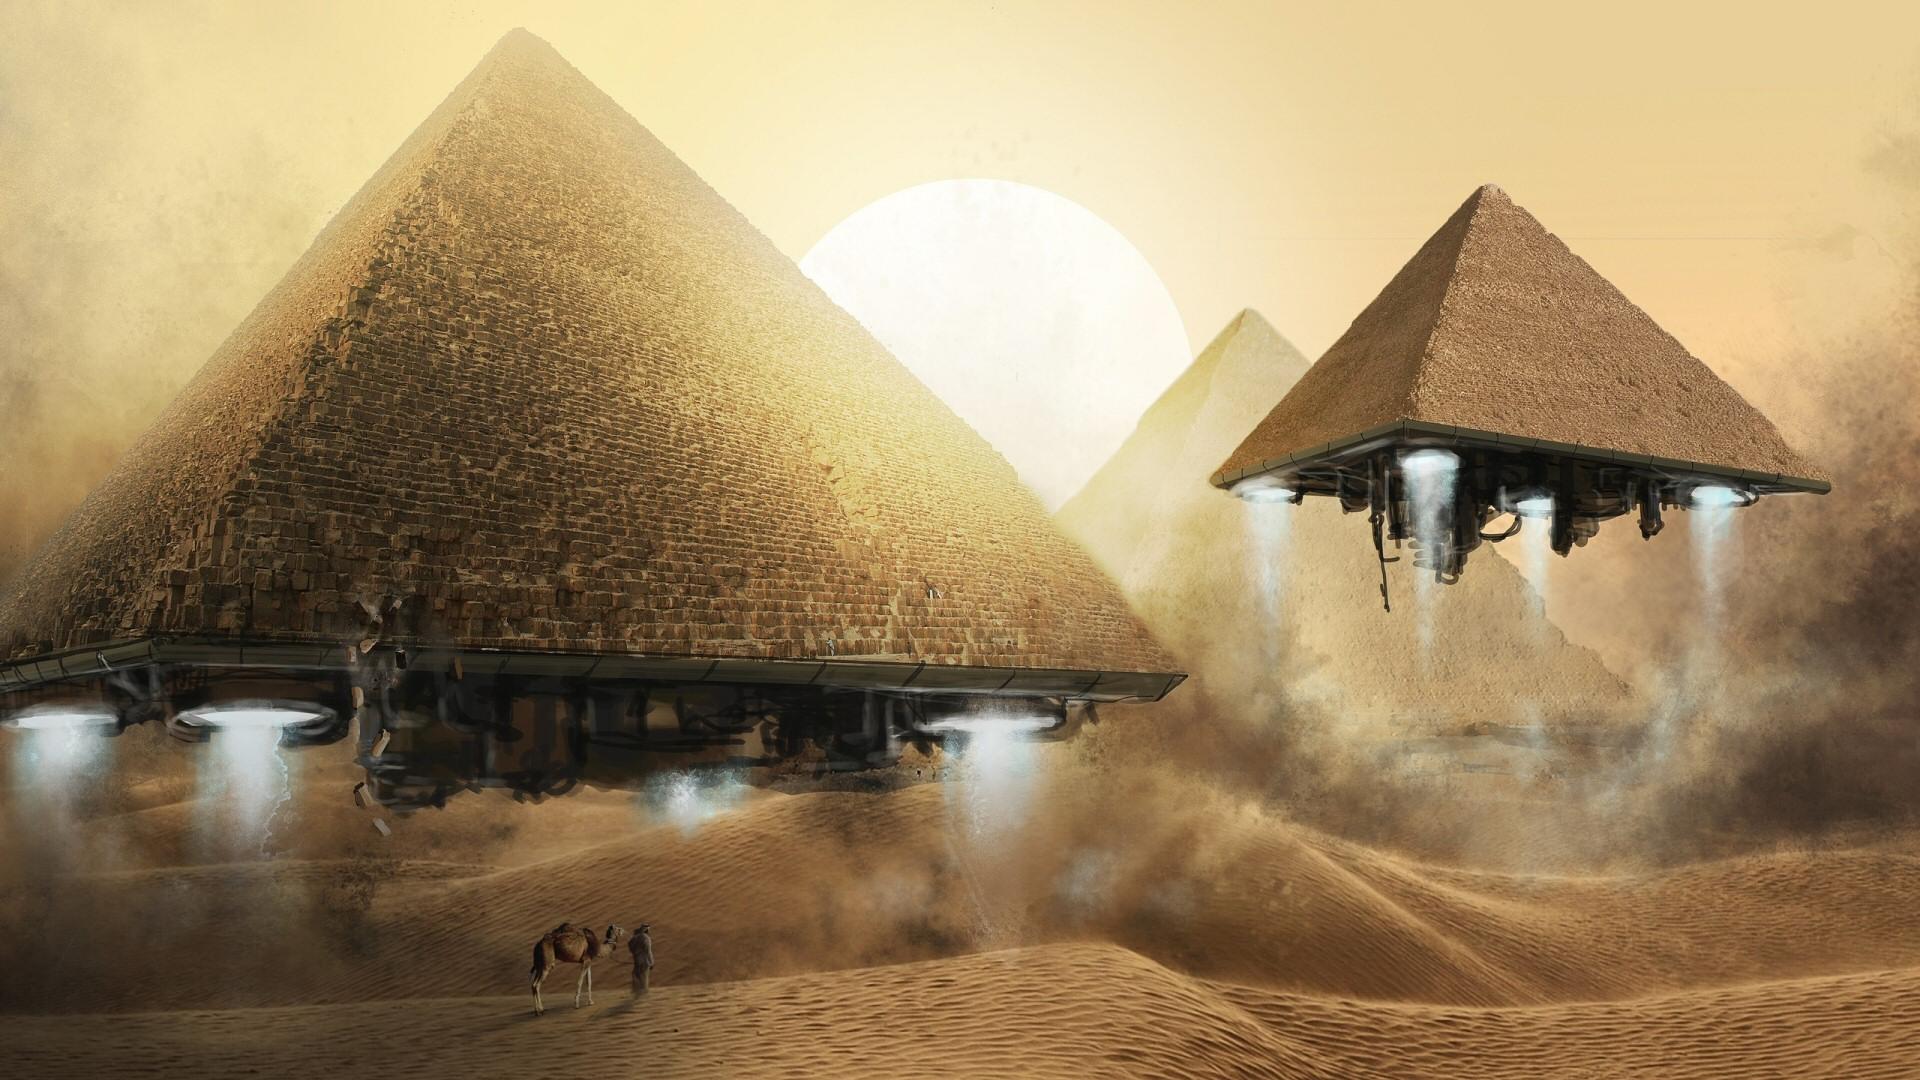 Earth Station Egypt